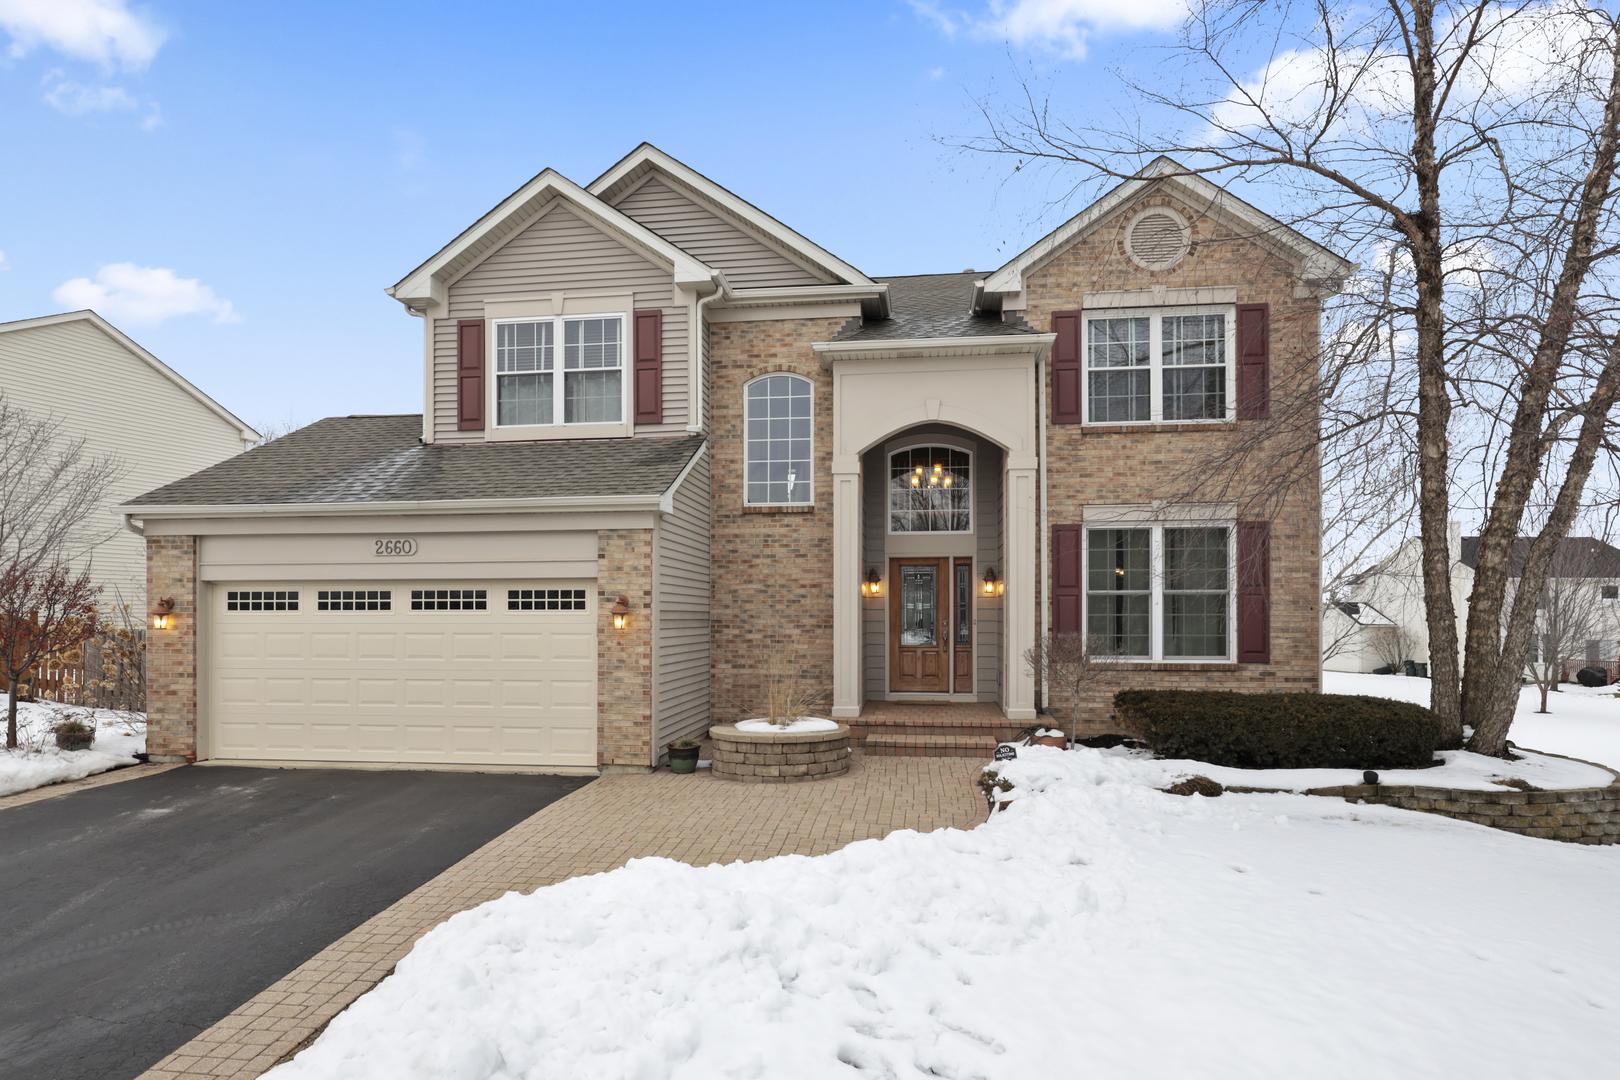 2660 Delaware Lane, Lindenhurst, Illinois 60046